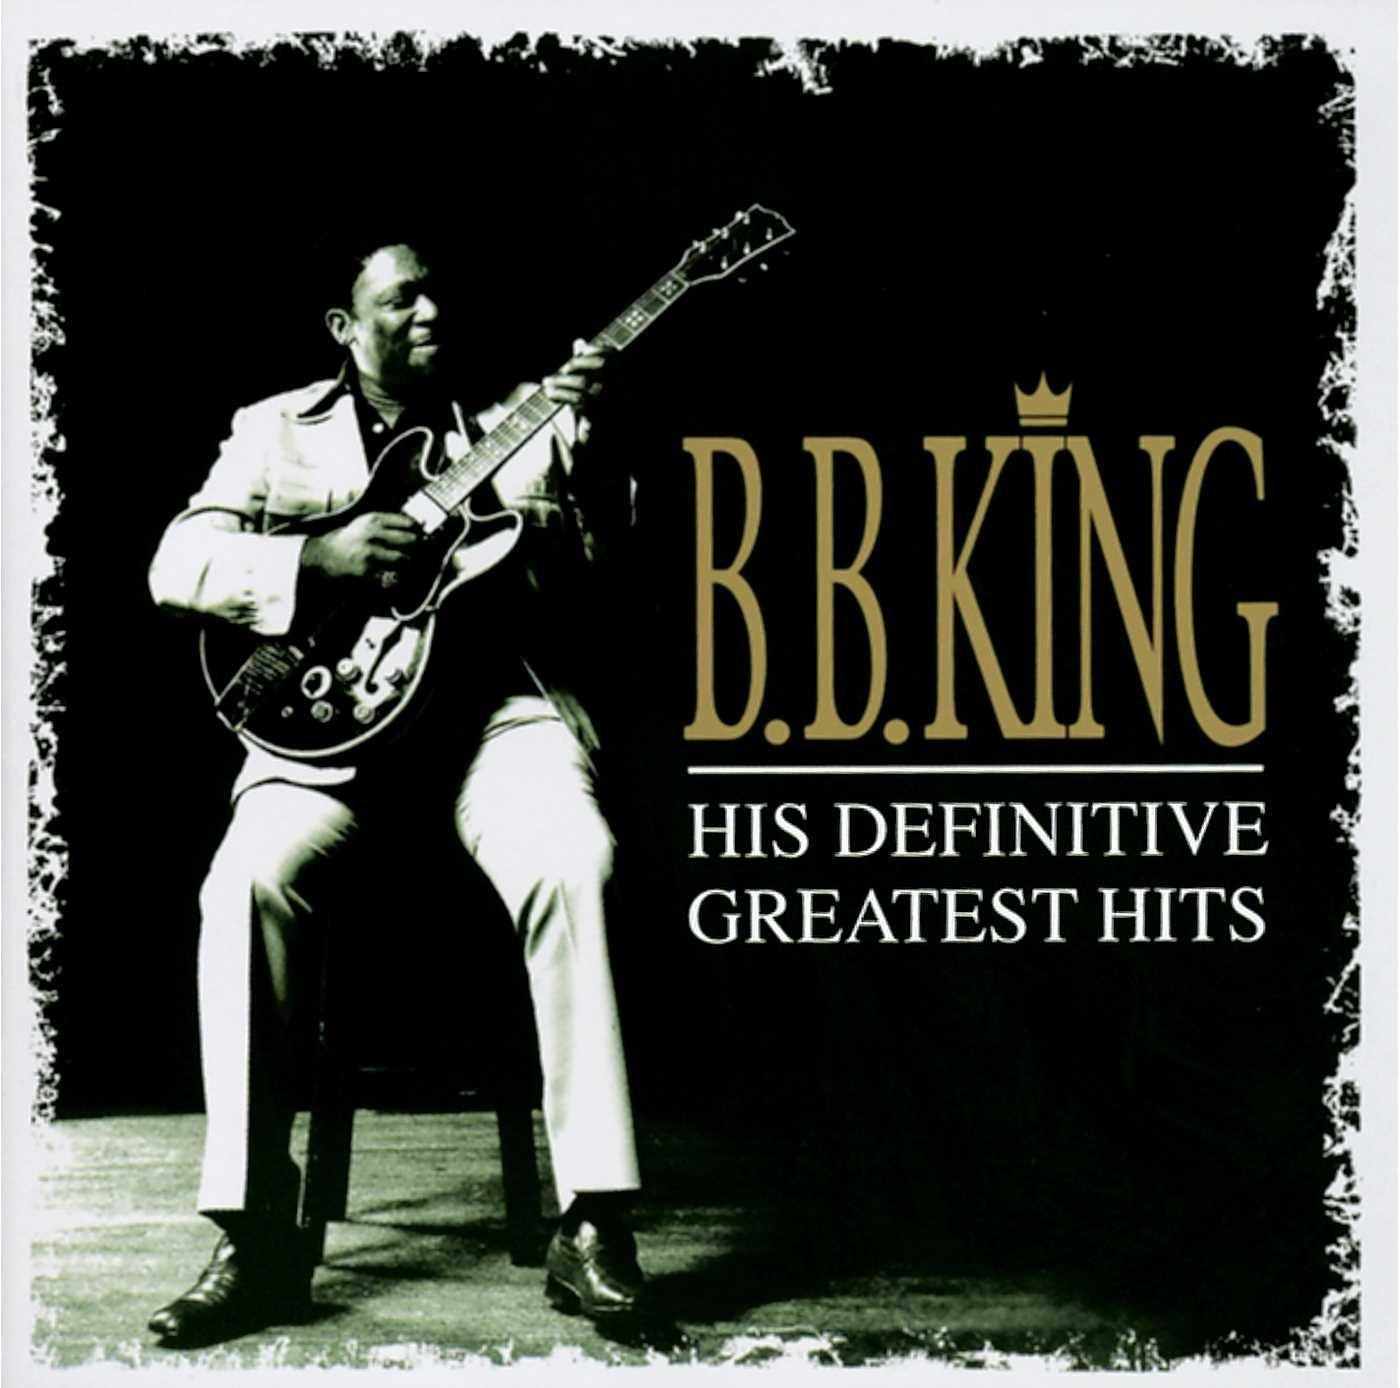 B. B. King: His Definitive Greatest Hits by King, B.B.